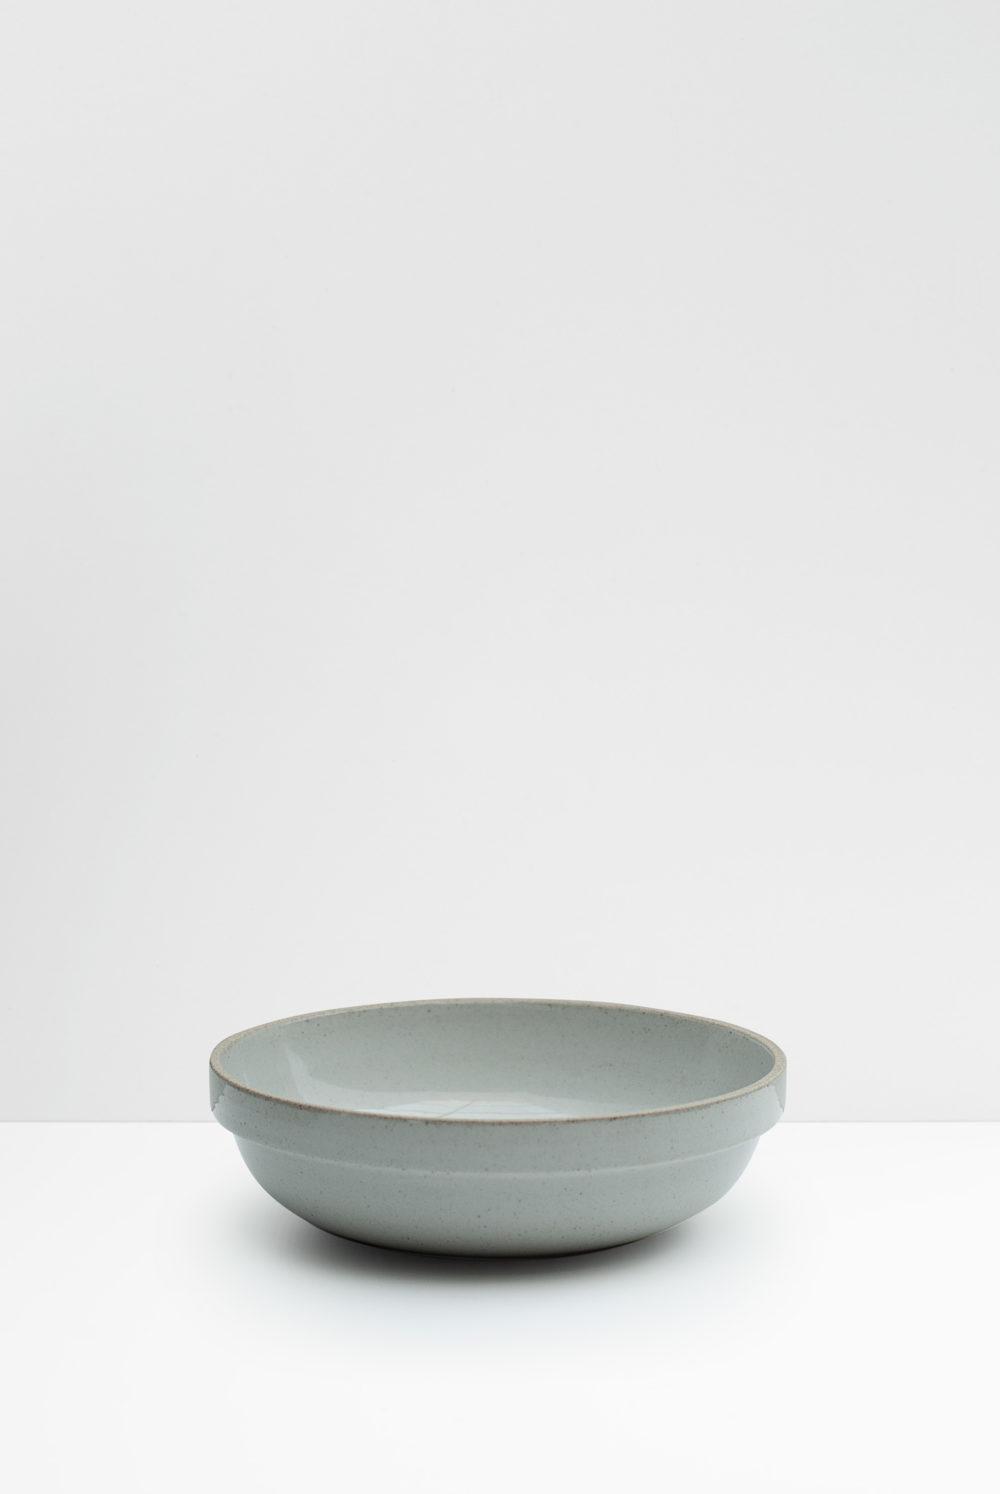 Hasami Soup bowl gray glazed